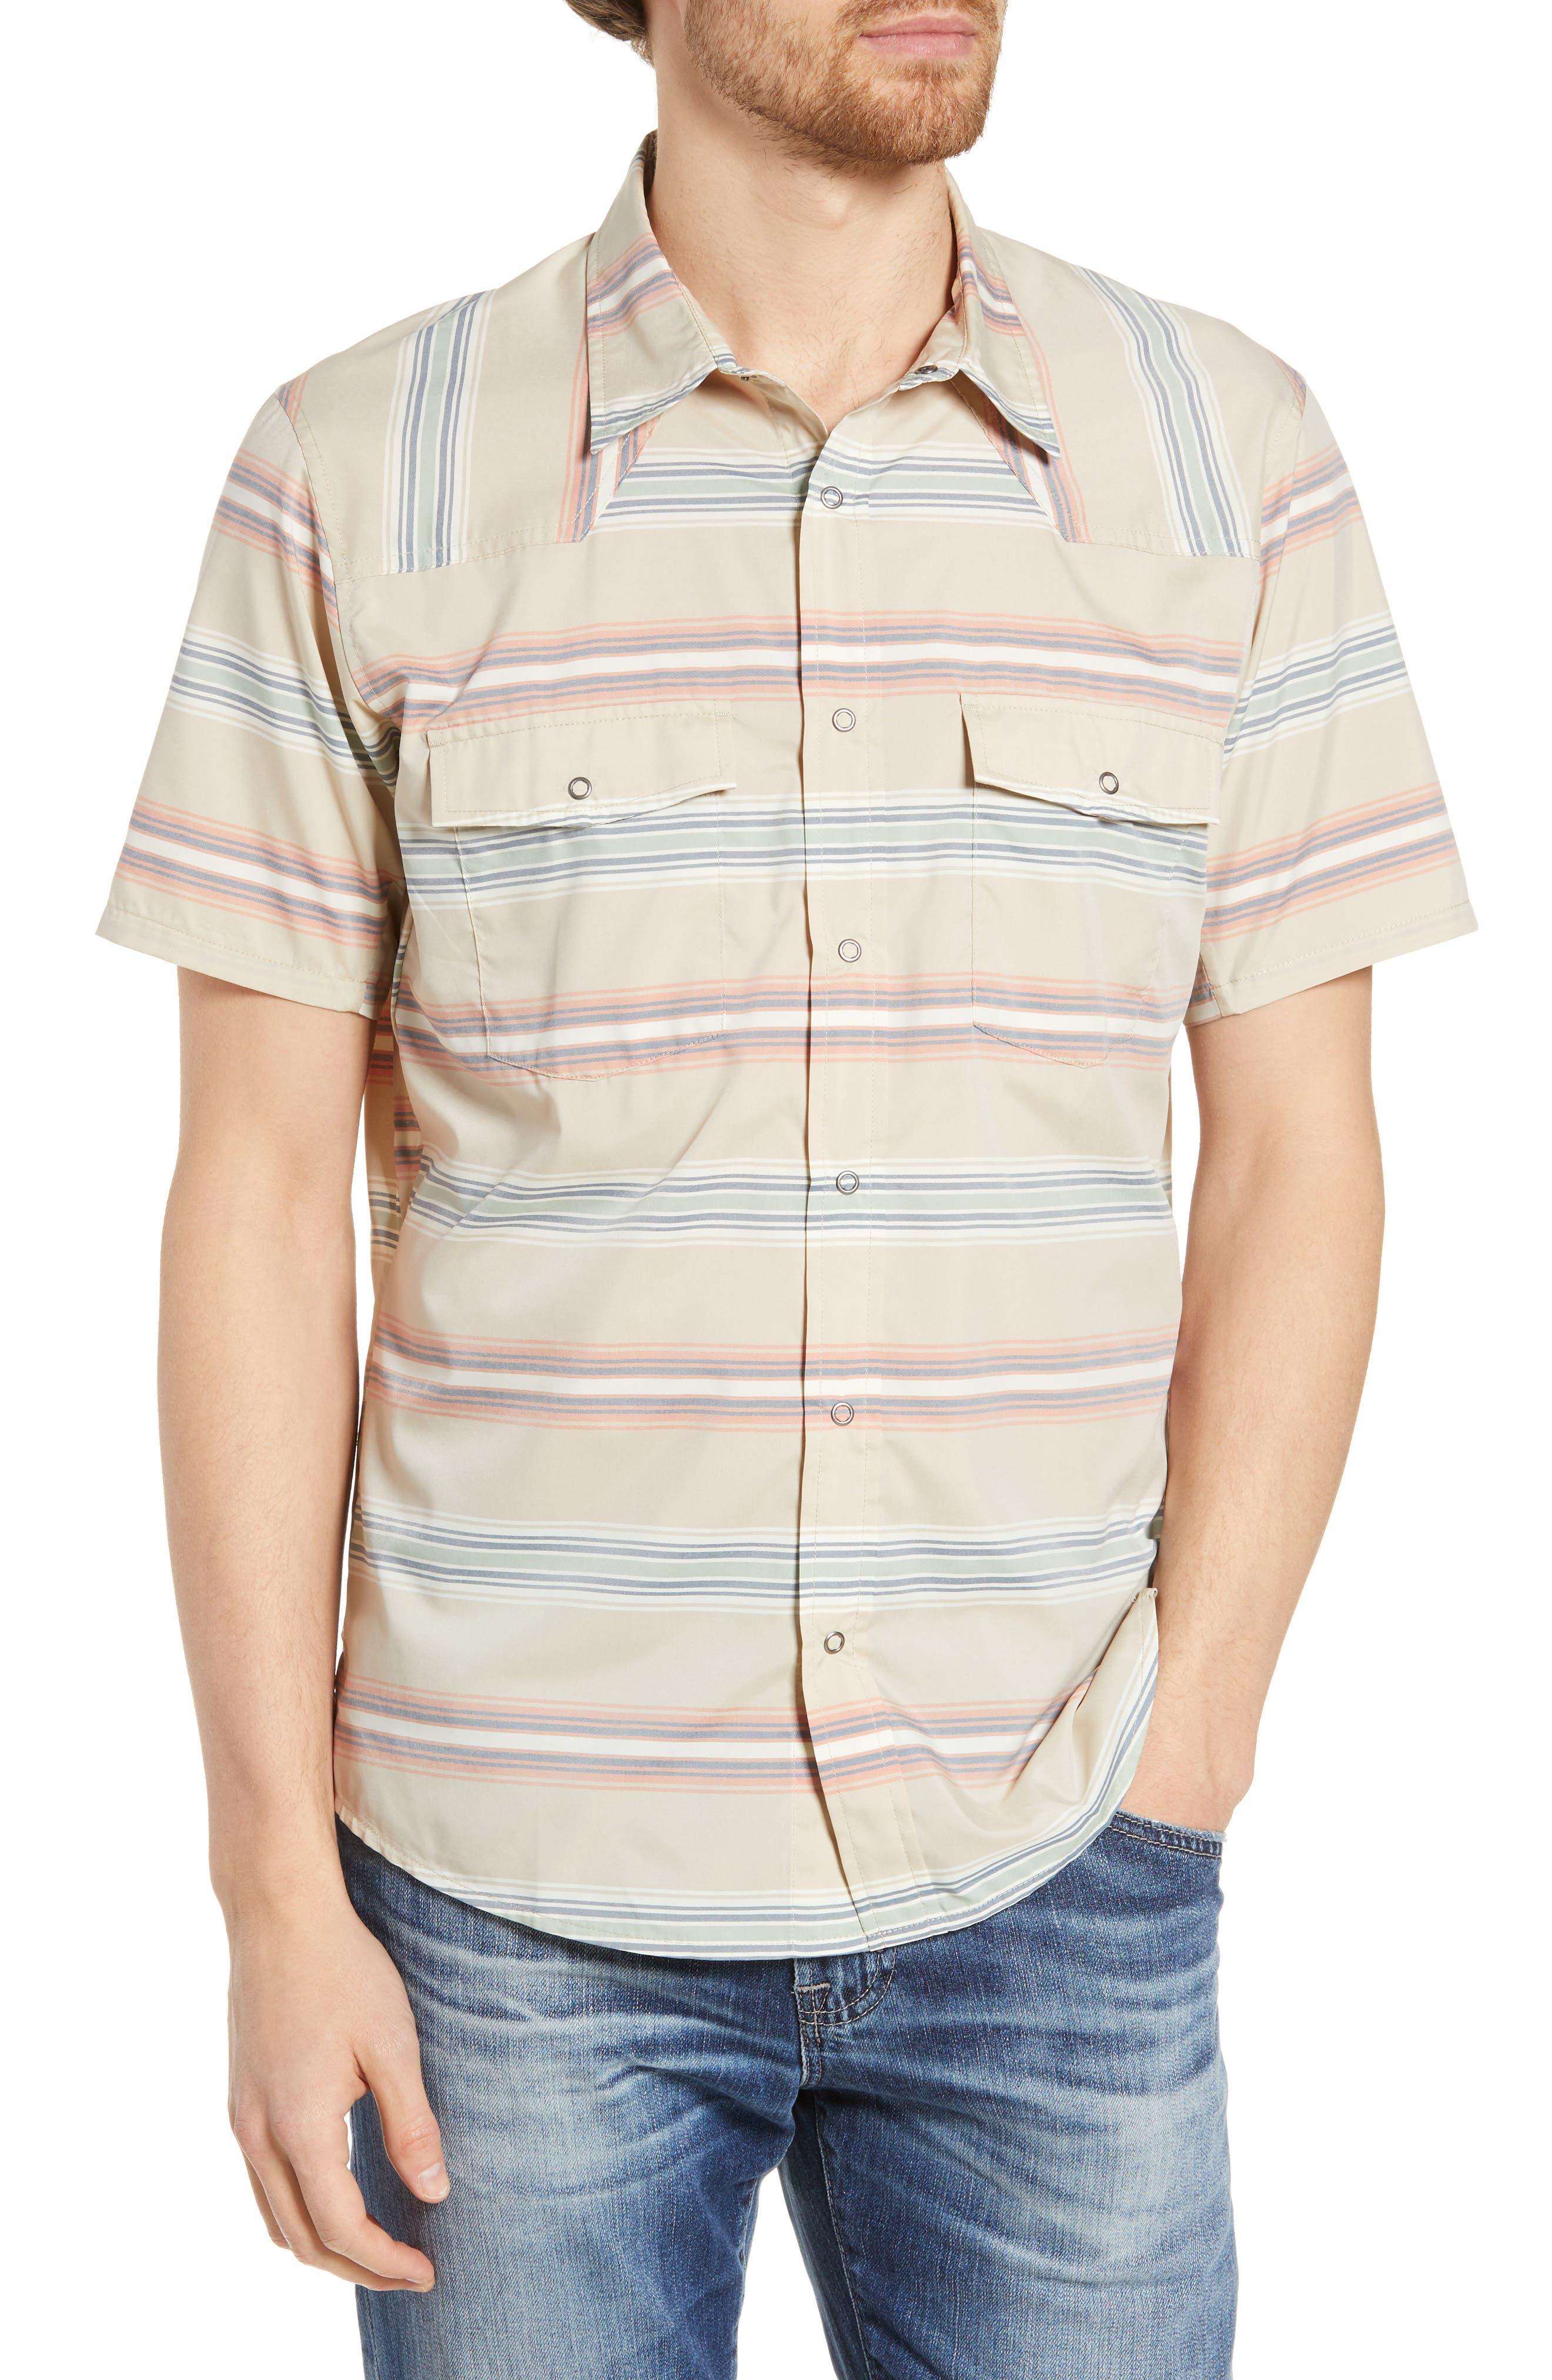 Patagonia Bandito Regular Fit Short Sleeve Sport Shirt, Beige